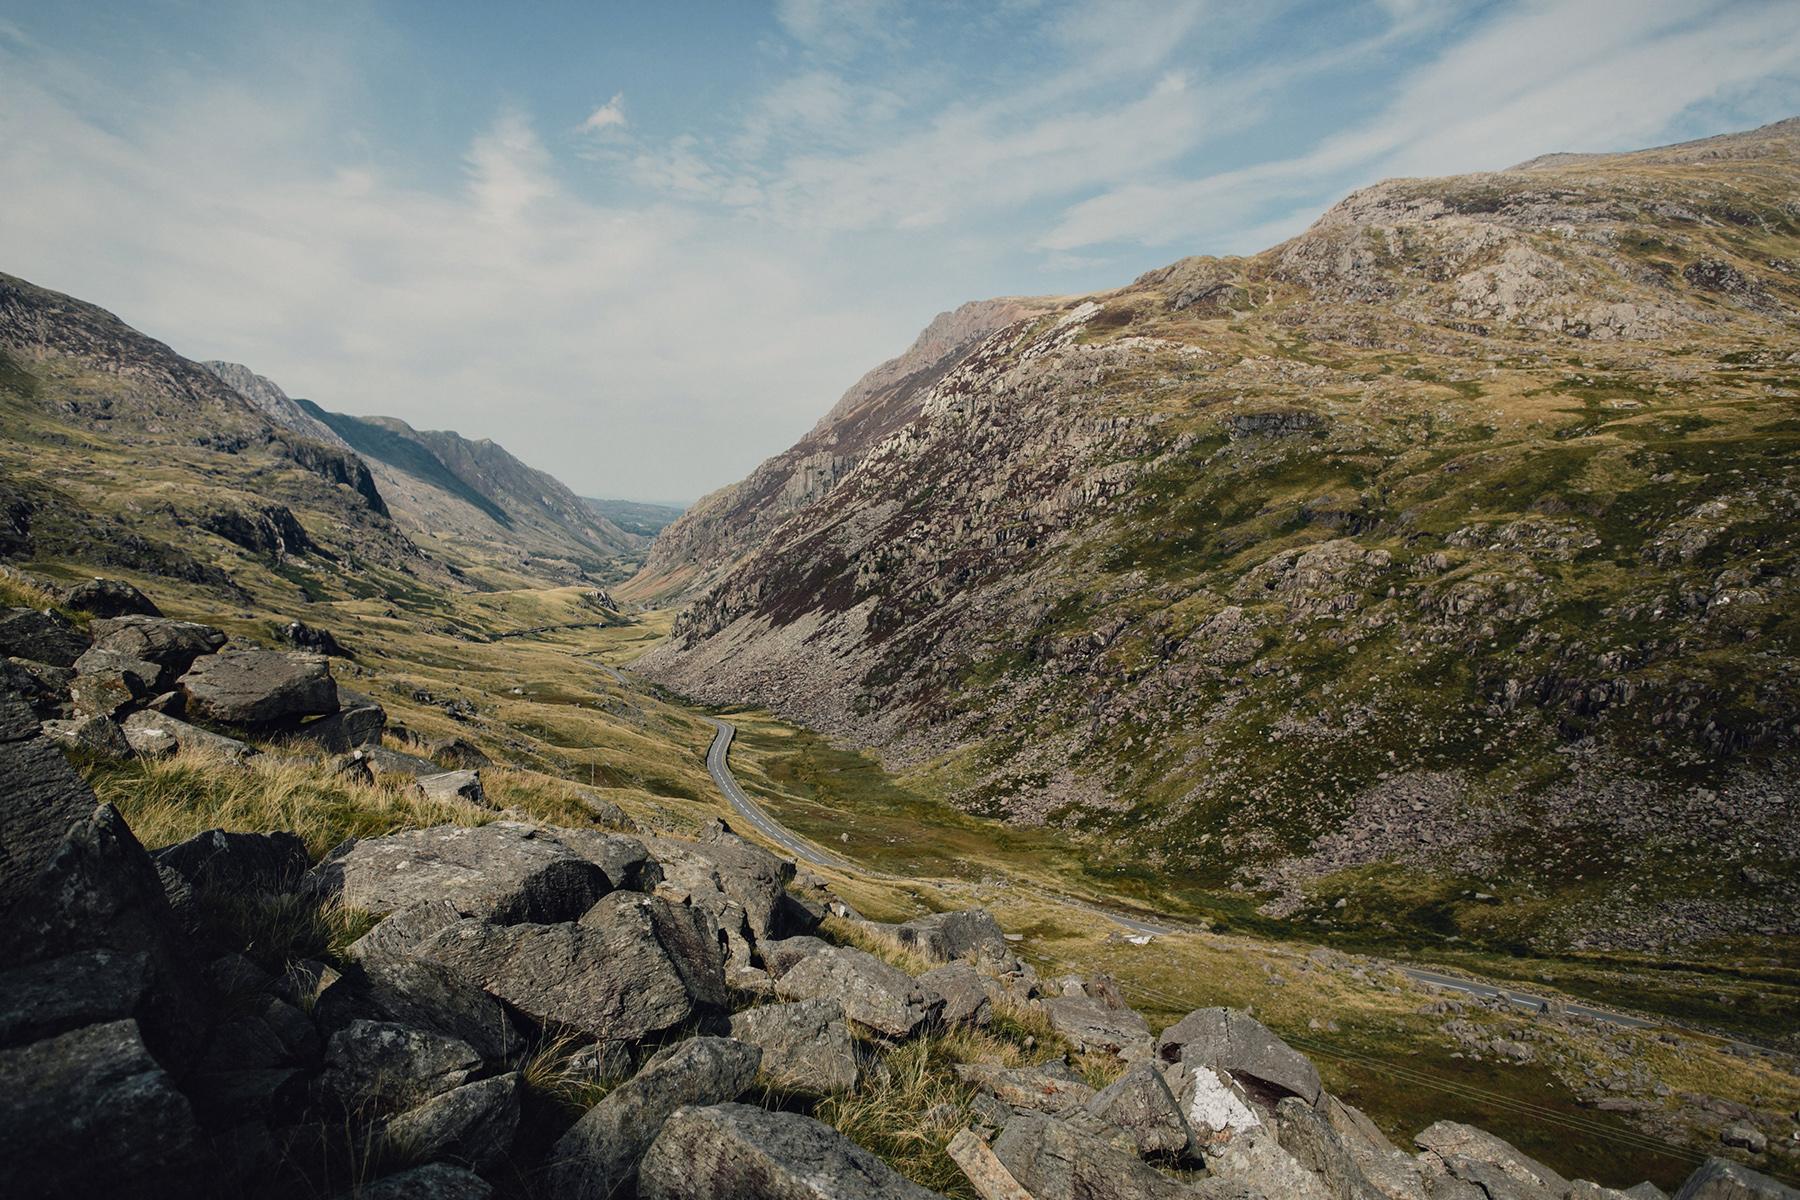 Mt-Snowdon-Hike-Photos-From-Peny-Pass-00011.jpg